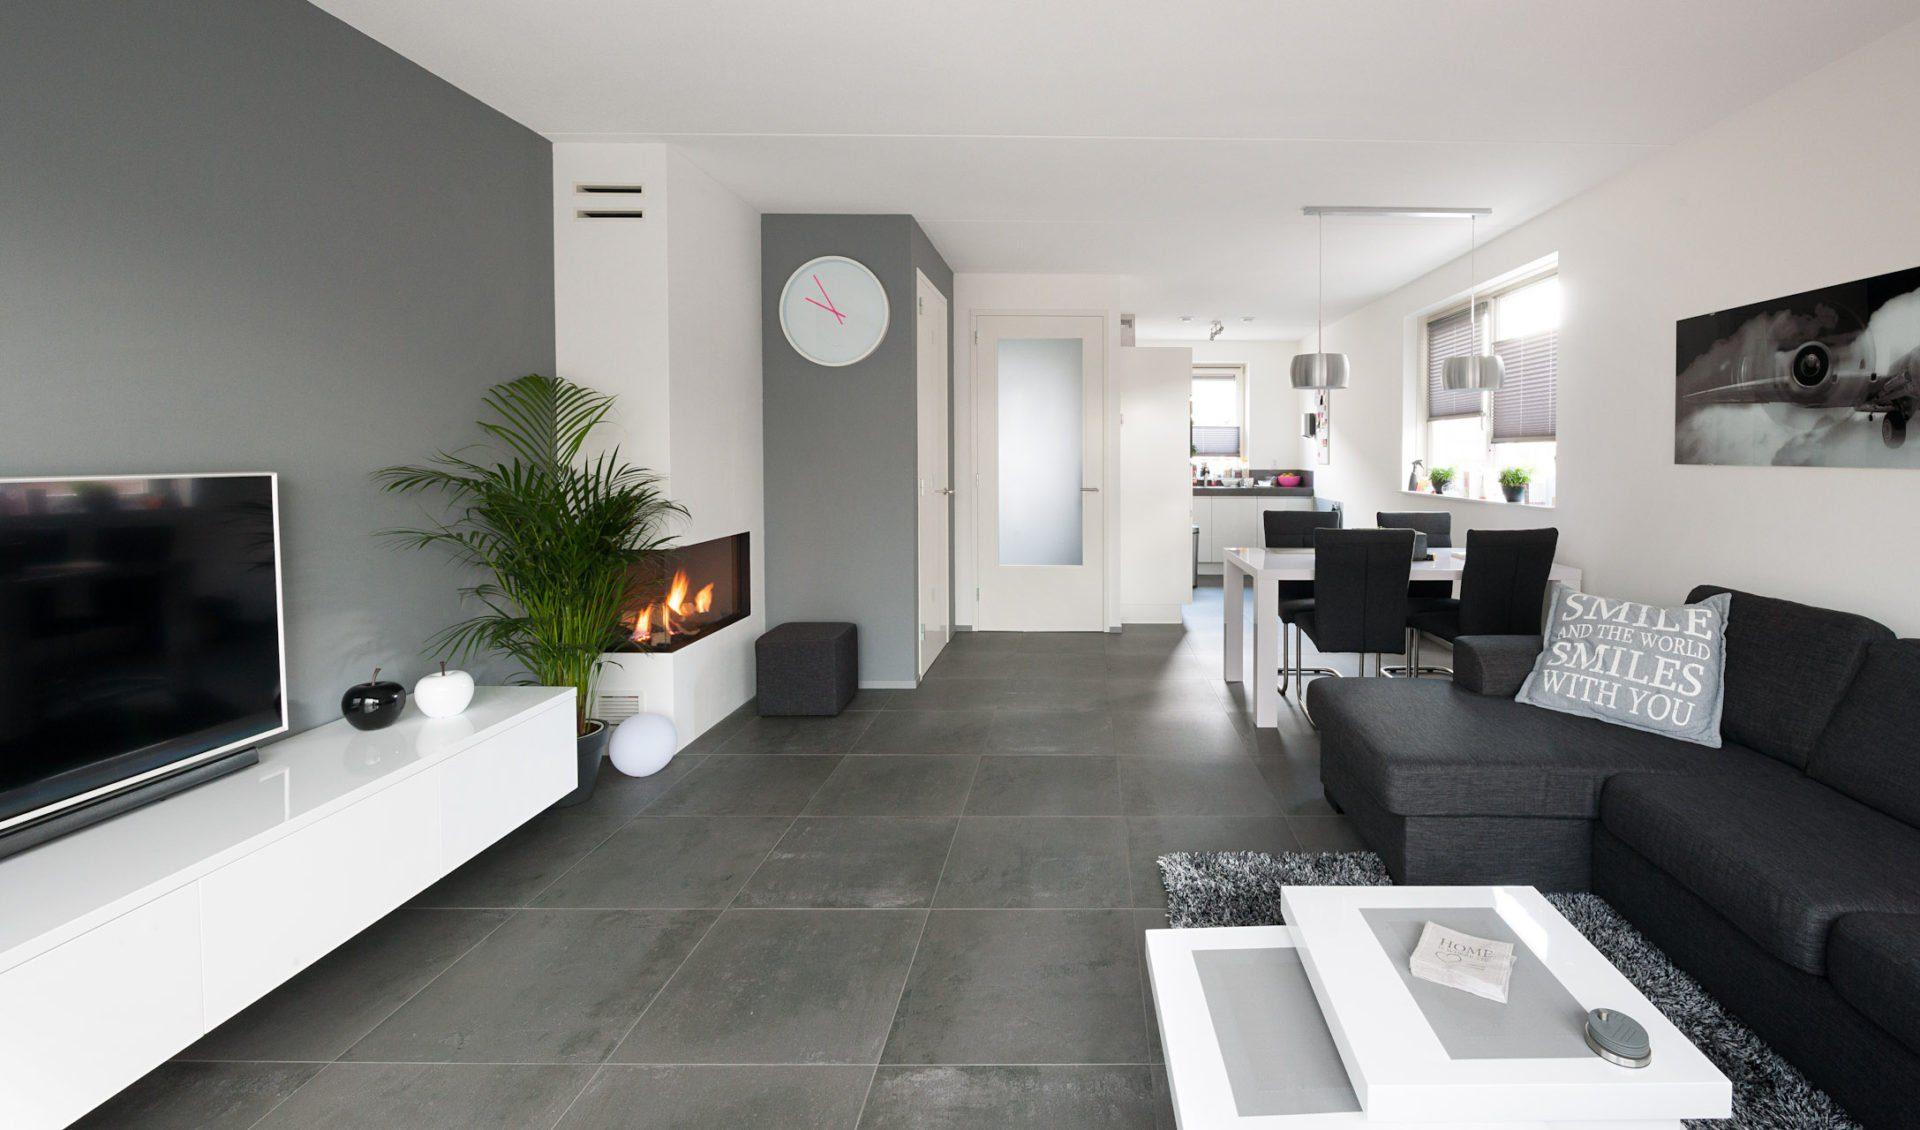 Vloertegels woonkamer kroon vloeren in steen for Welke nl woonkamer